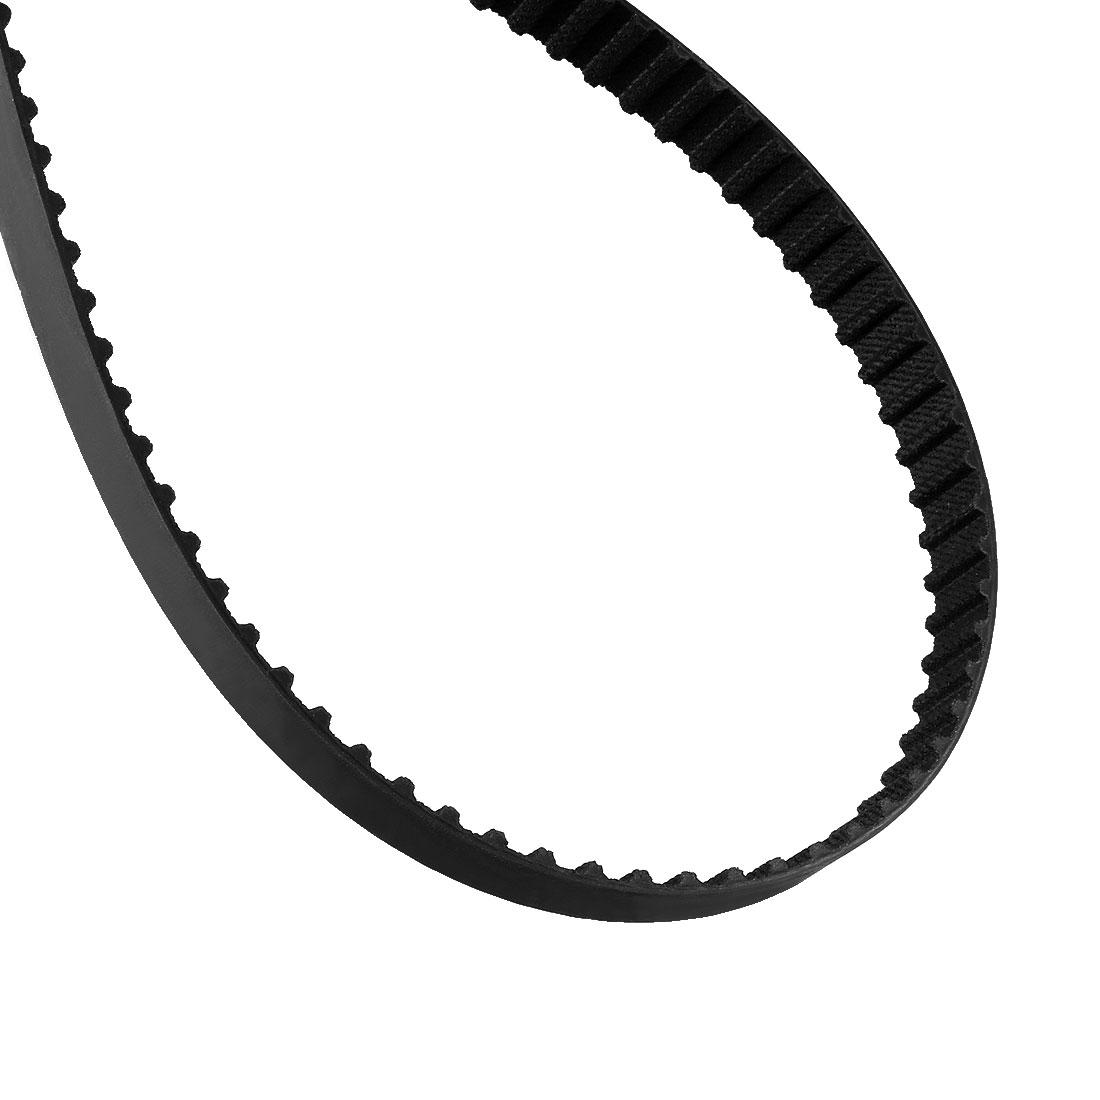 430XL 215 Teeth 10mm Width 5.08mm Pitch Stepper Motor Rubber Timing Geared Belt